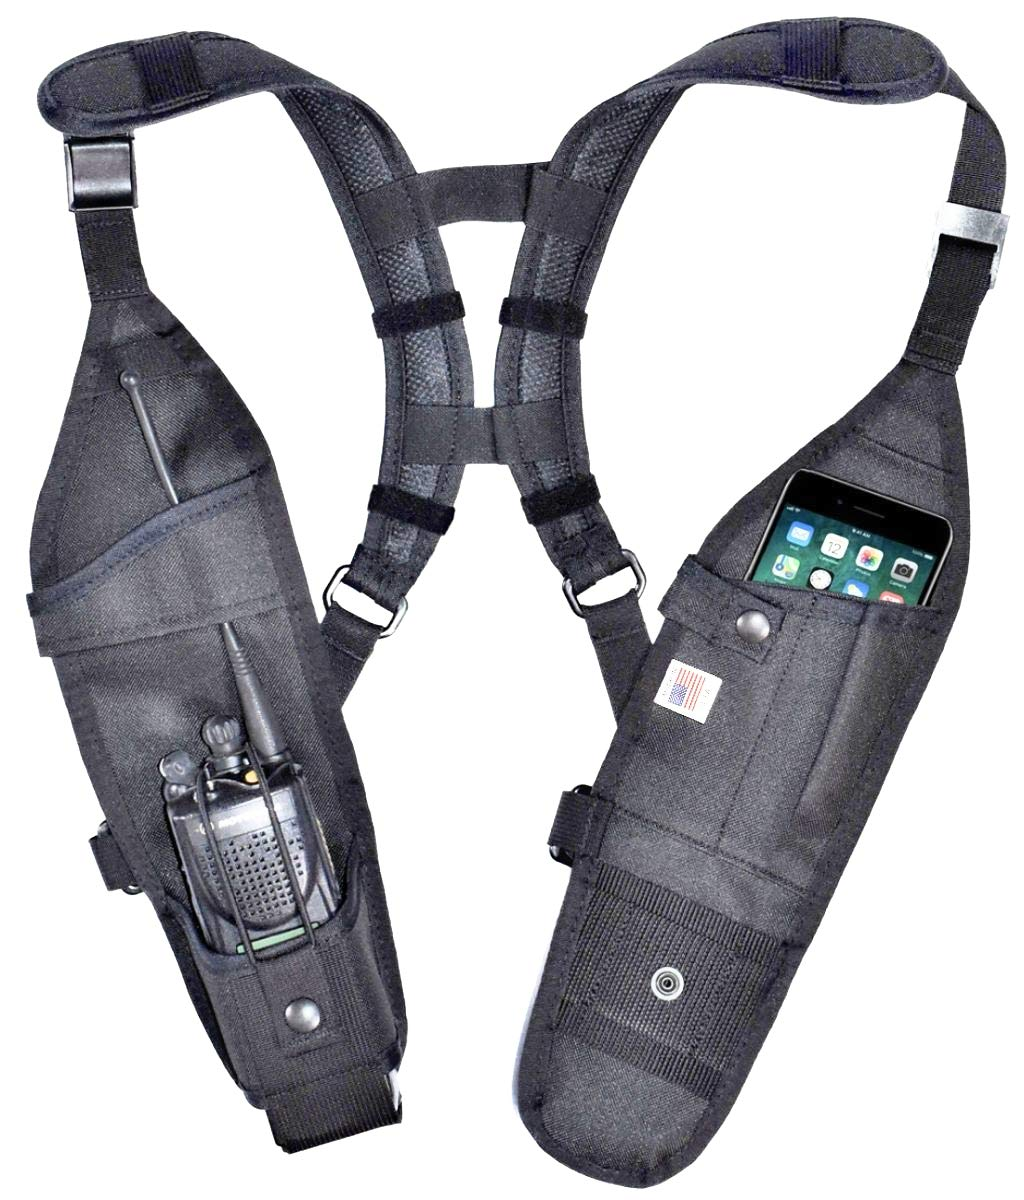 Universal Double Shoulder Holster - 300D